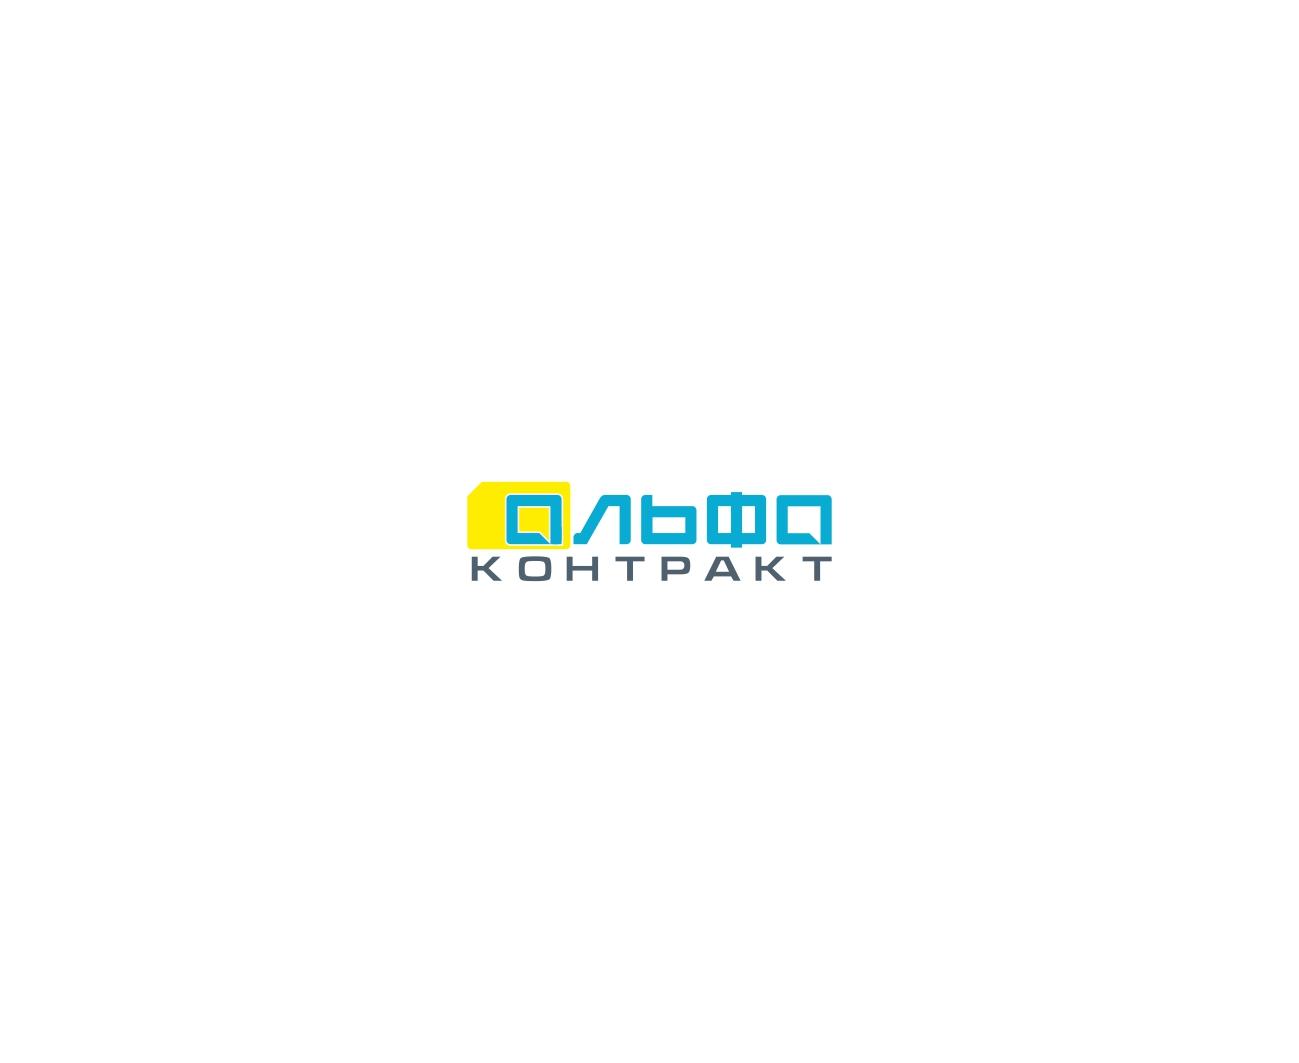 Дизайнер для разработки логотипа компании фото f_0395bf7c7e623c53.jpg